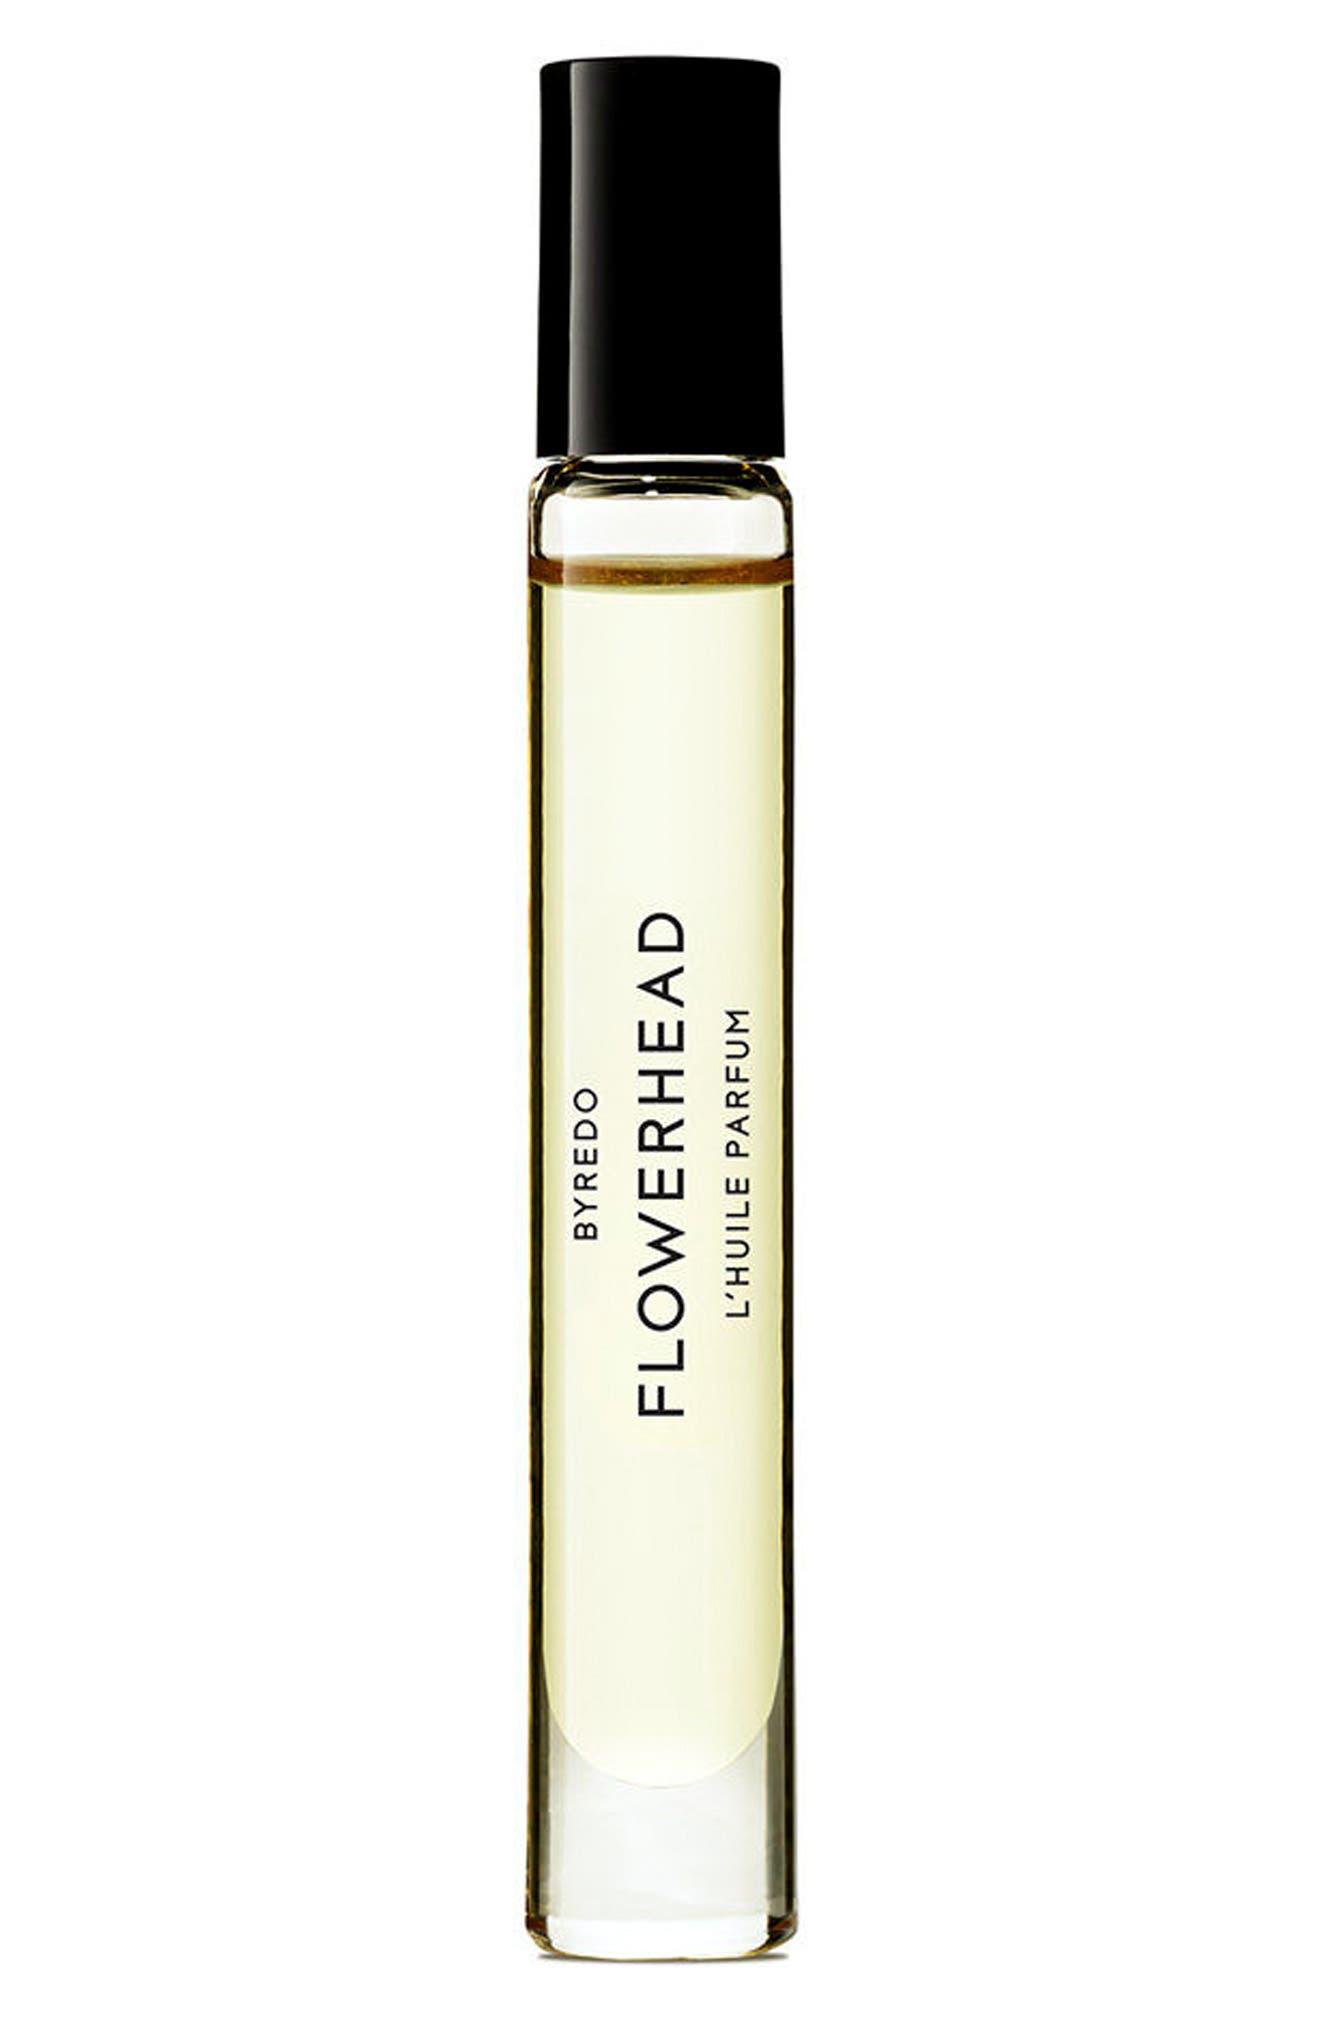 Main Image - BYREDO Flowerhead Eau de Parfum Rollerball